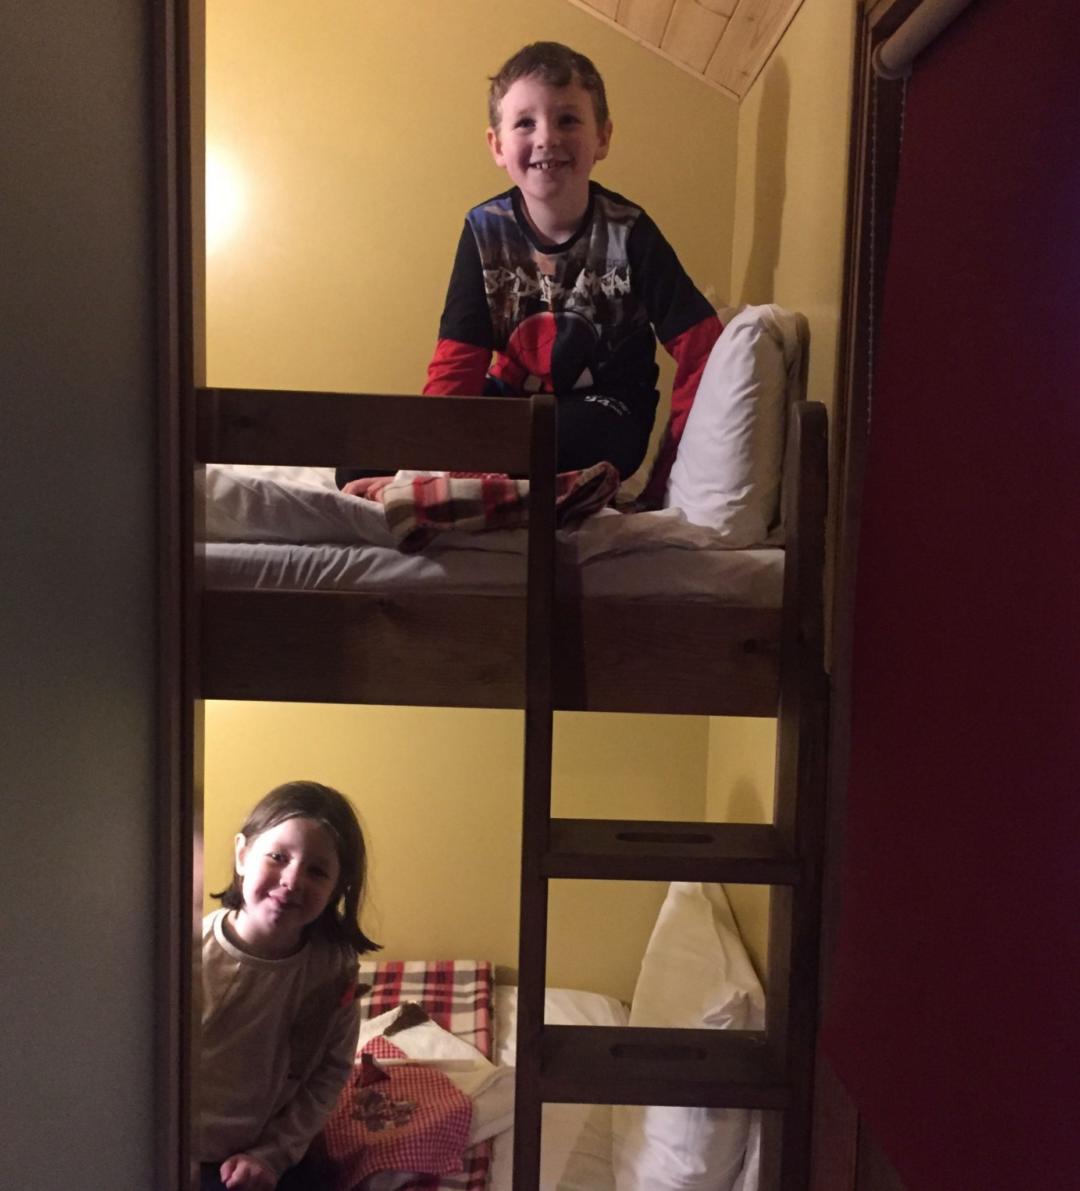 The bunk beds the kids sleept in on the santa sleepover